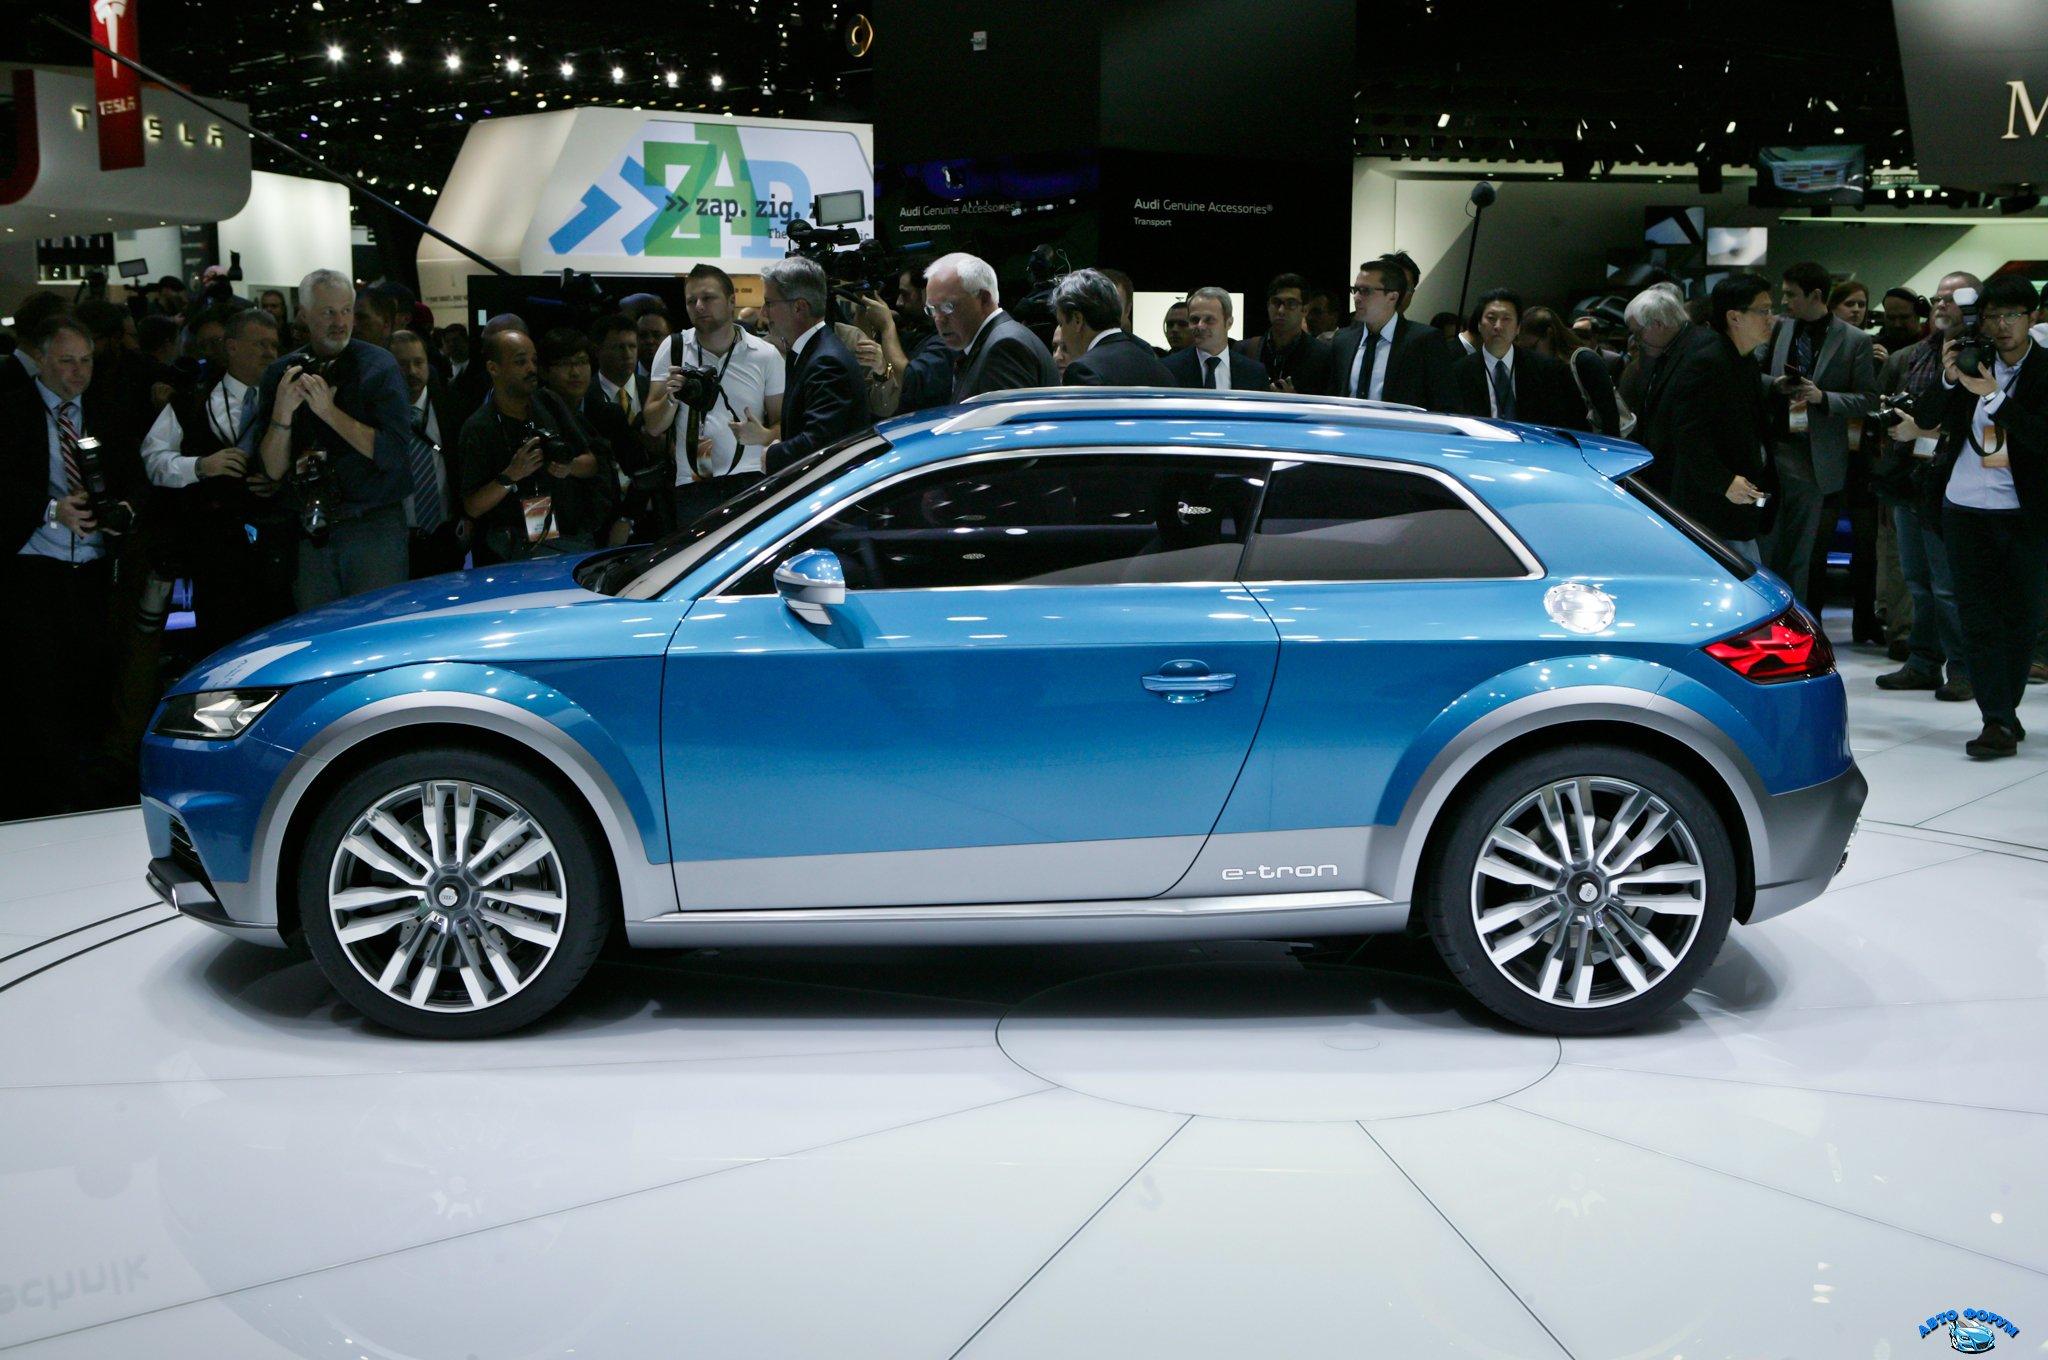 Audi-Allroad-Shooting-Brake-Concept-side-profile-02.jpg